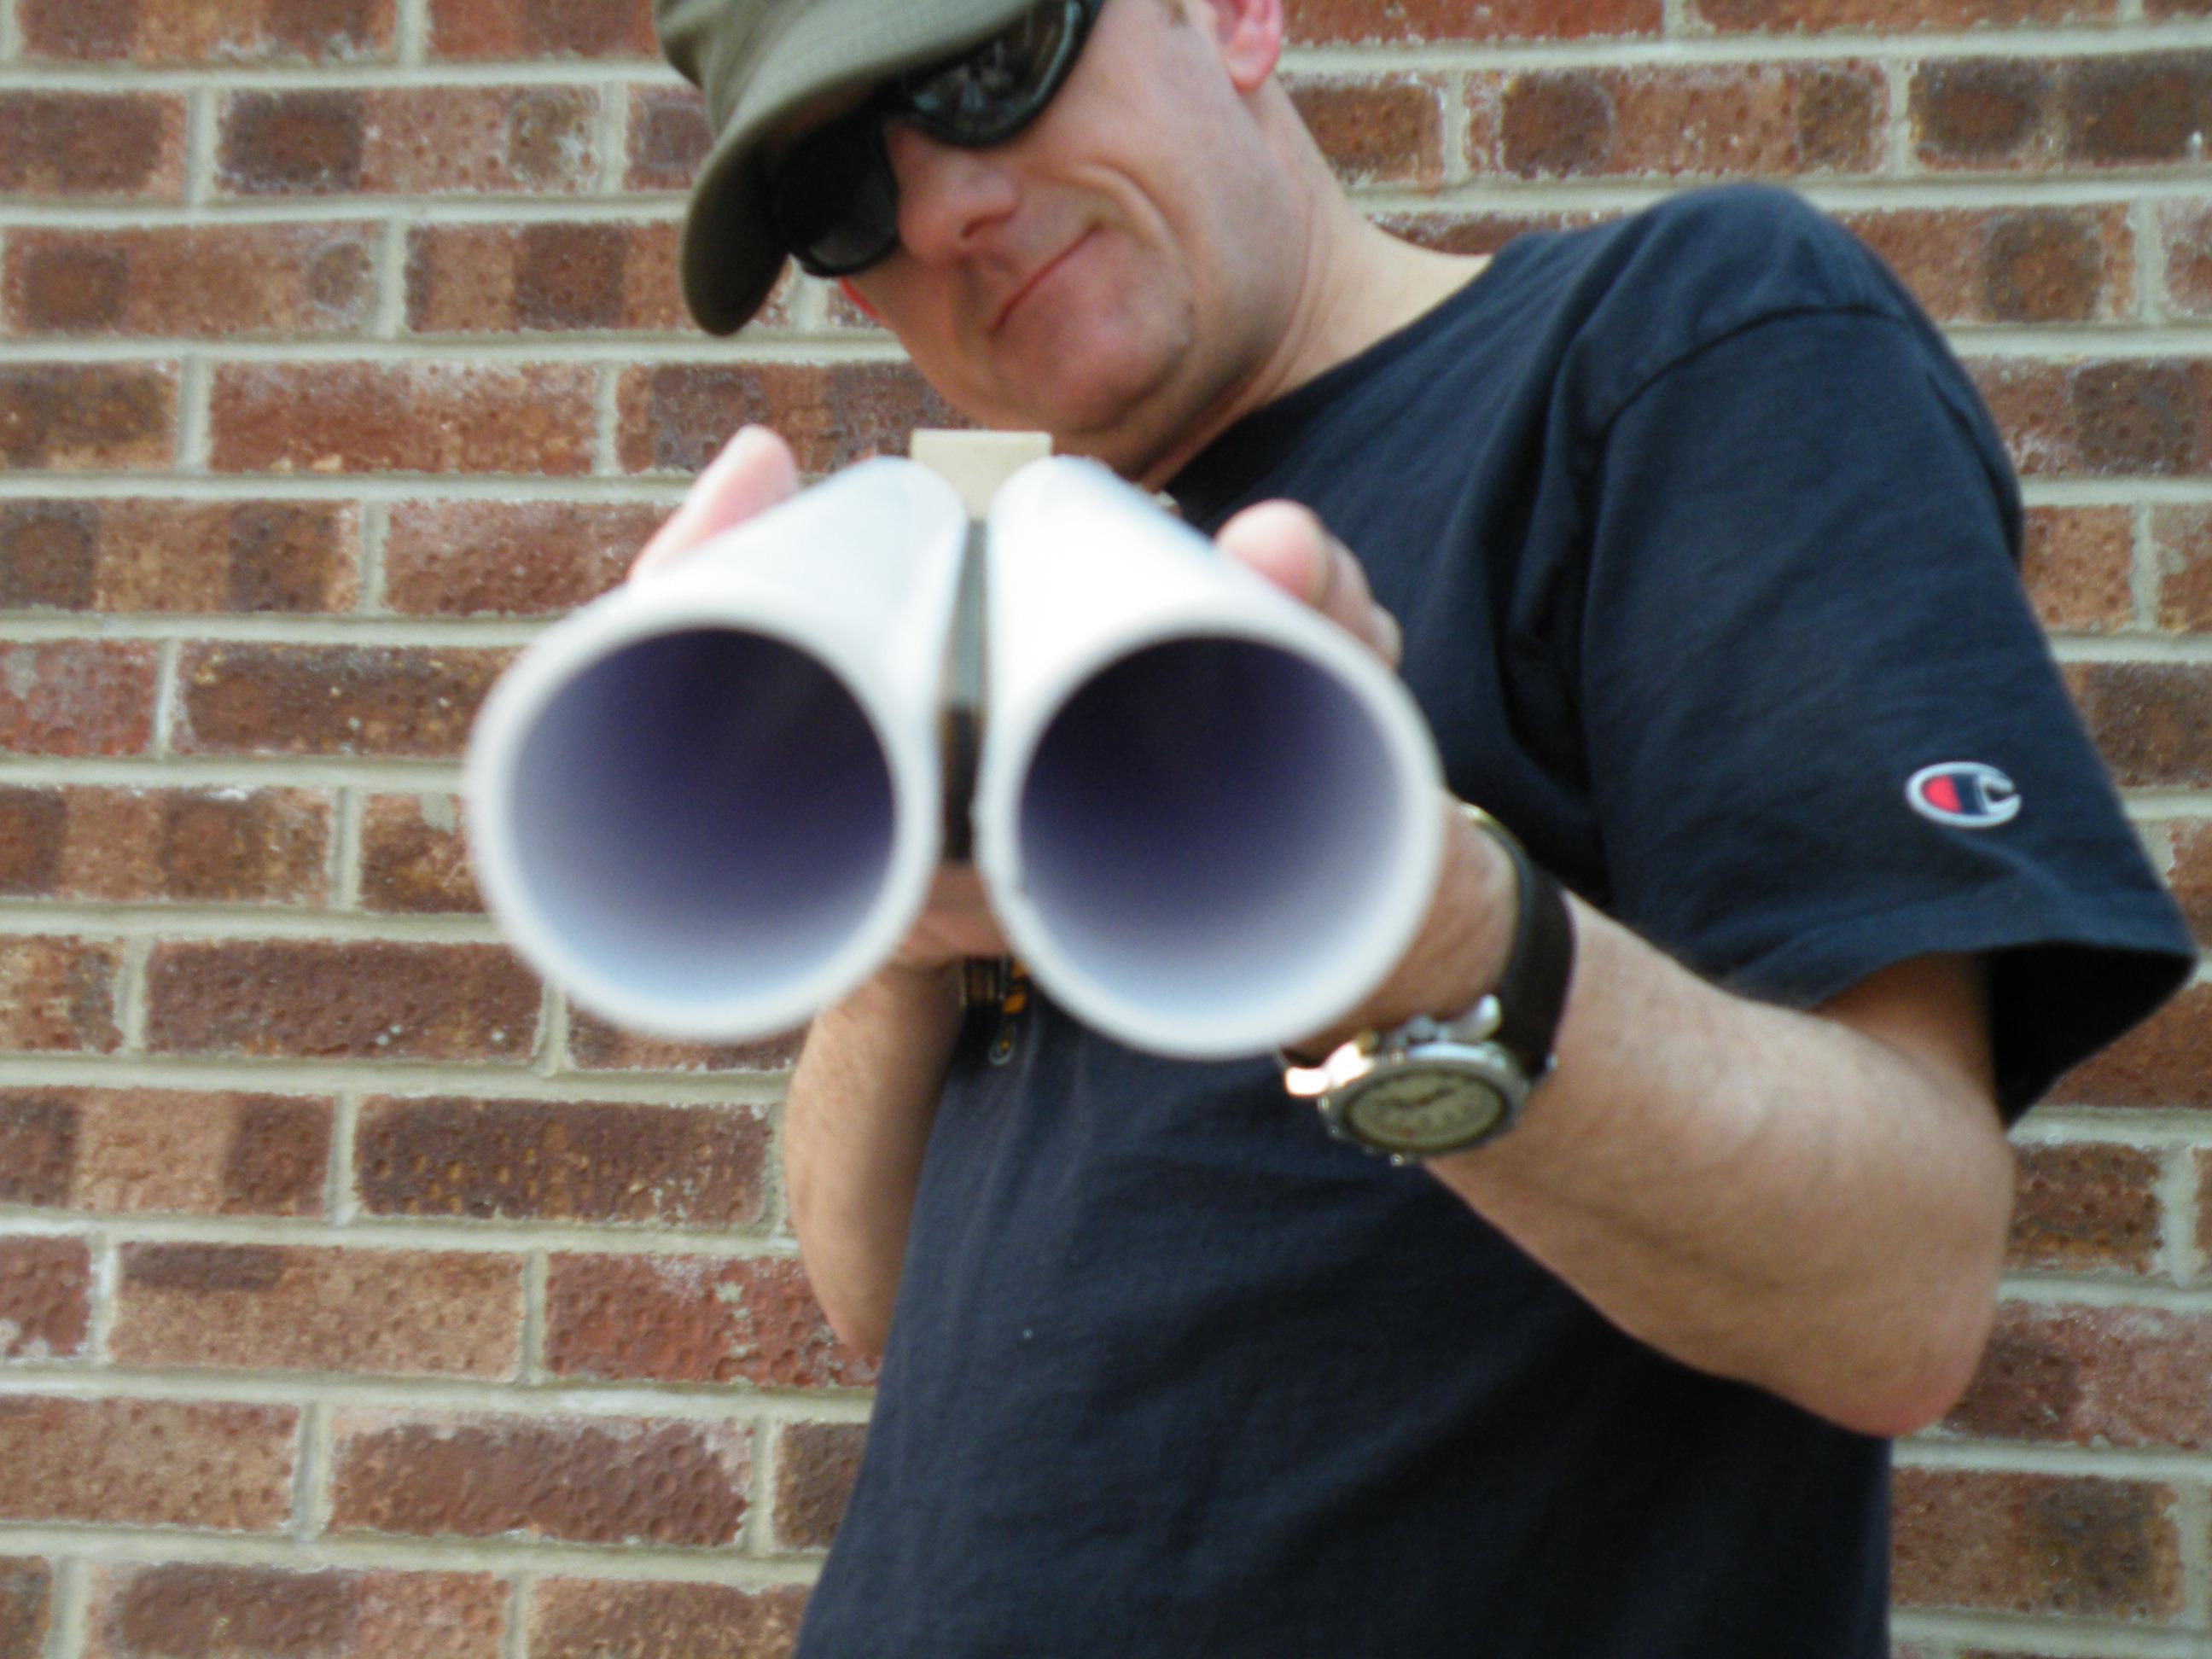 Picture of Double-Barrel Shotfun